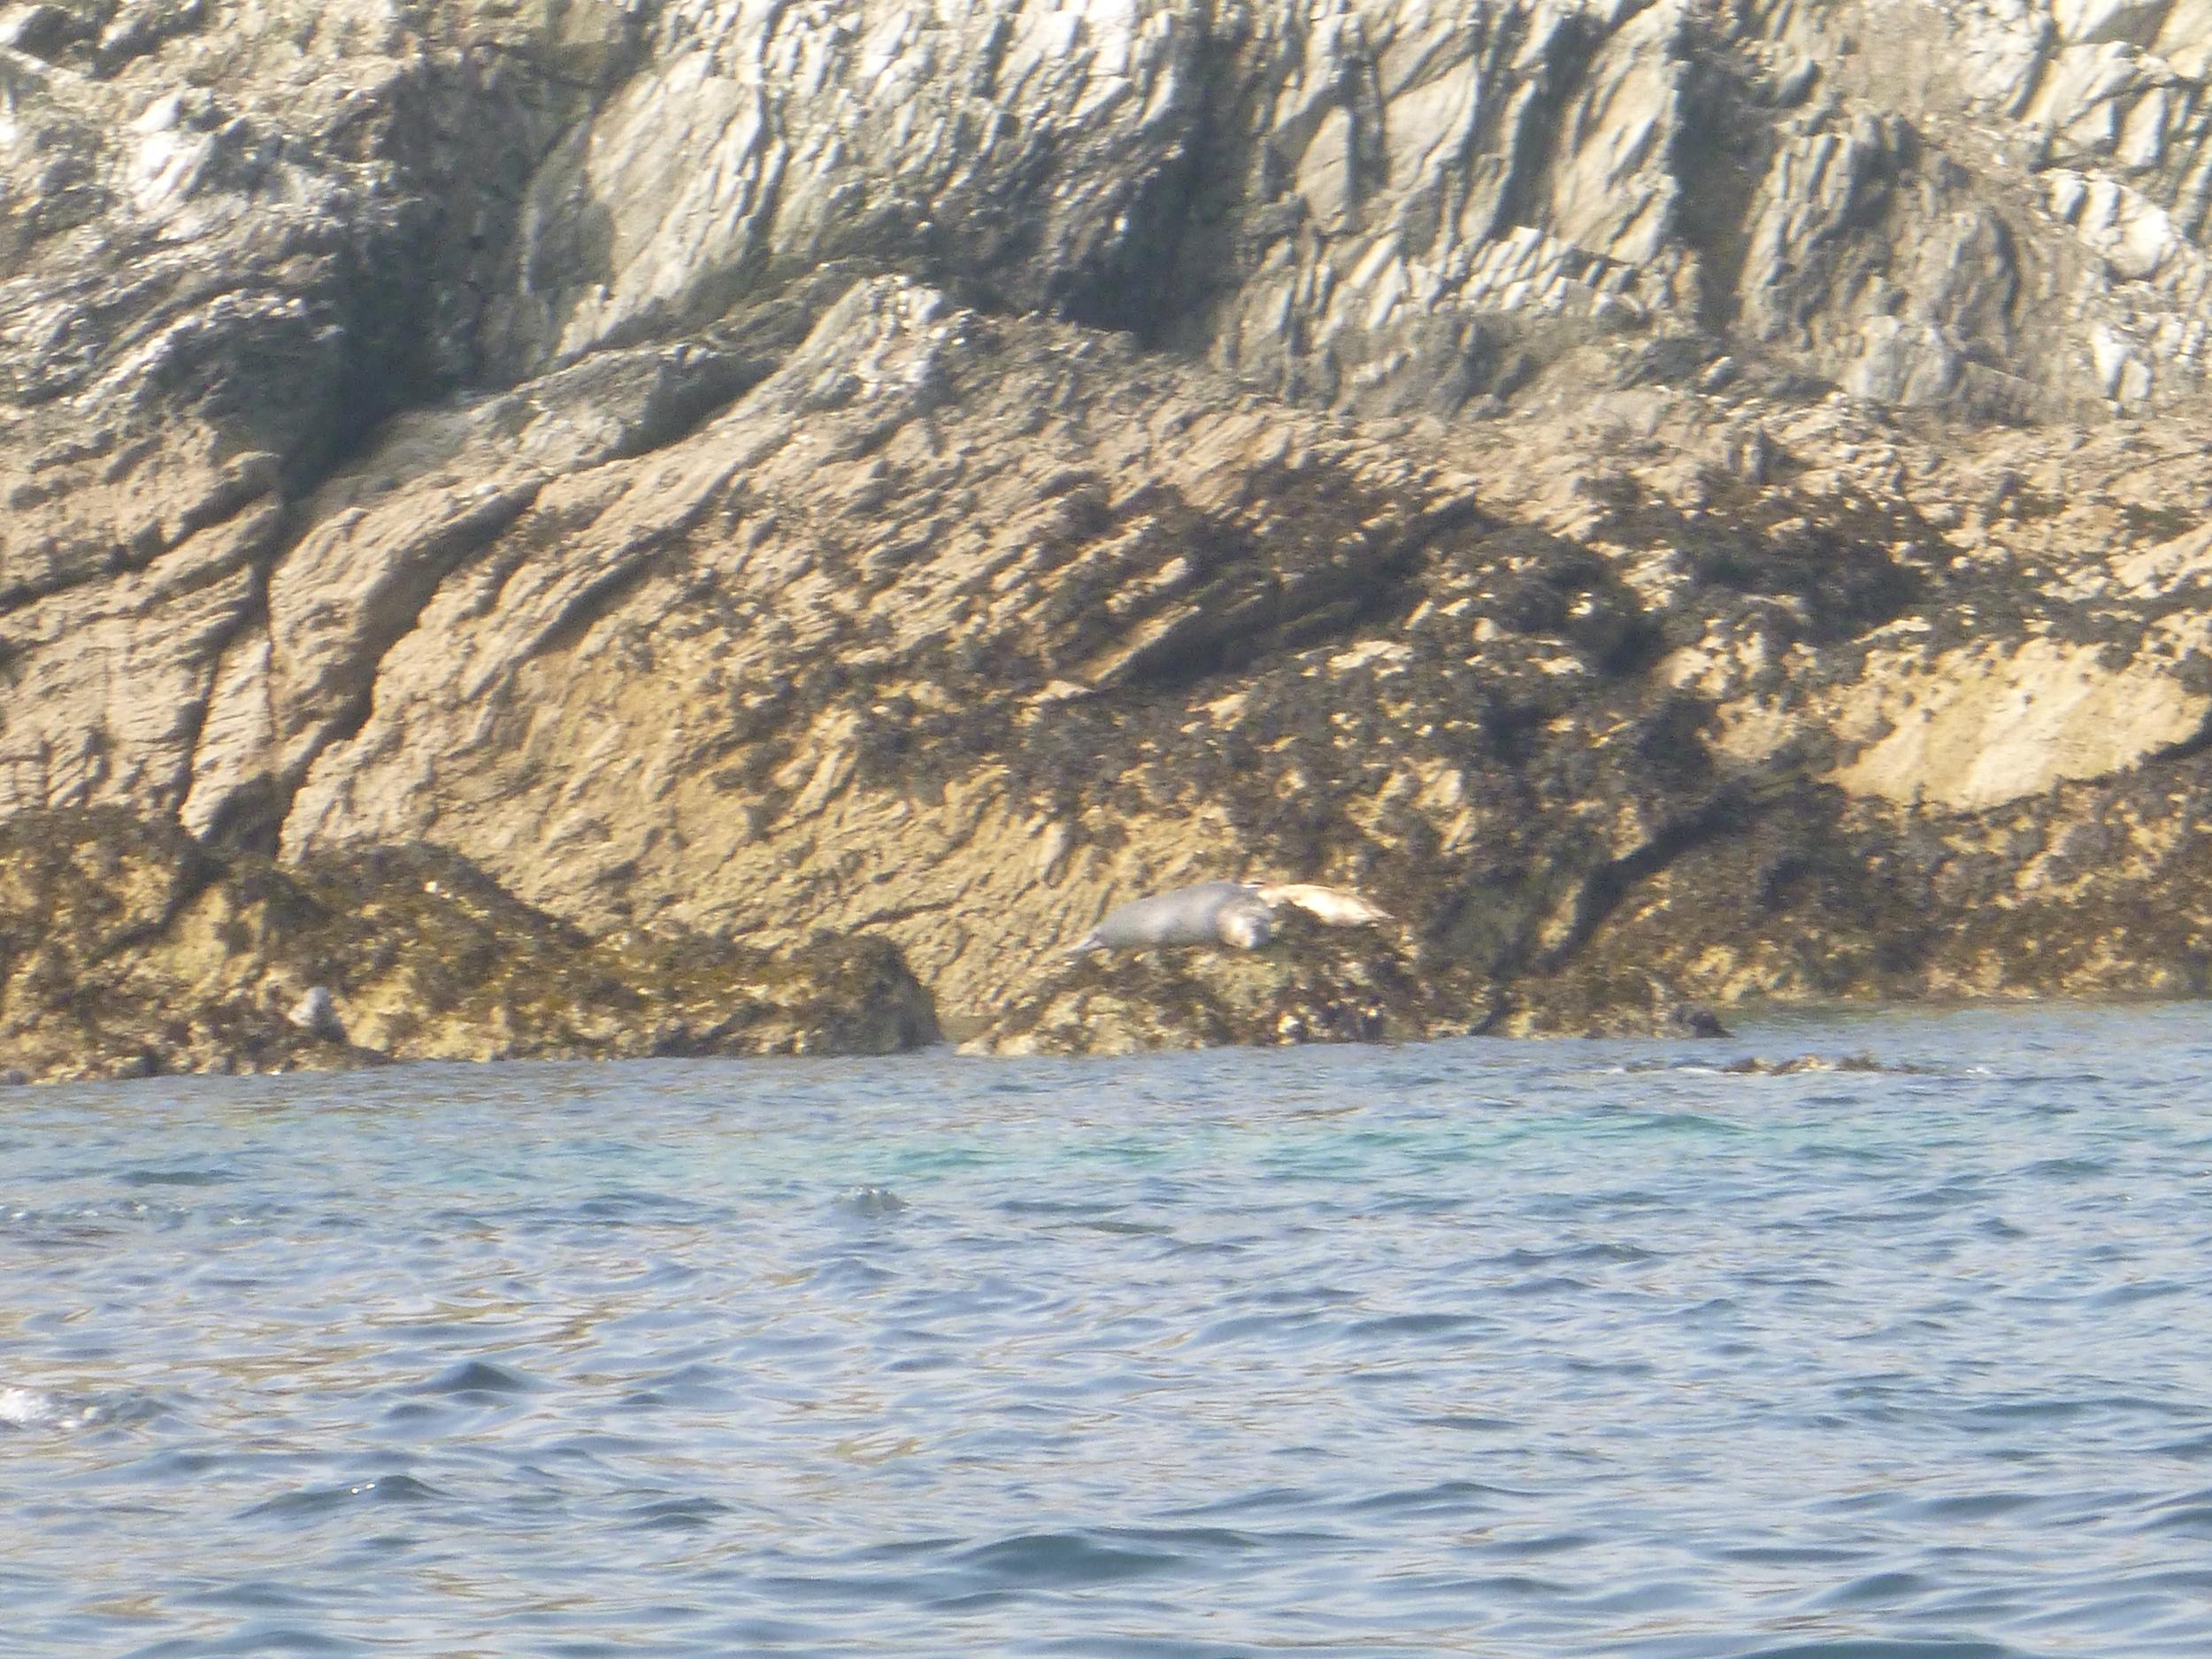 Seal Spotting Newquay